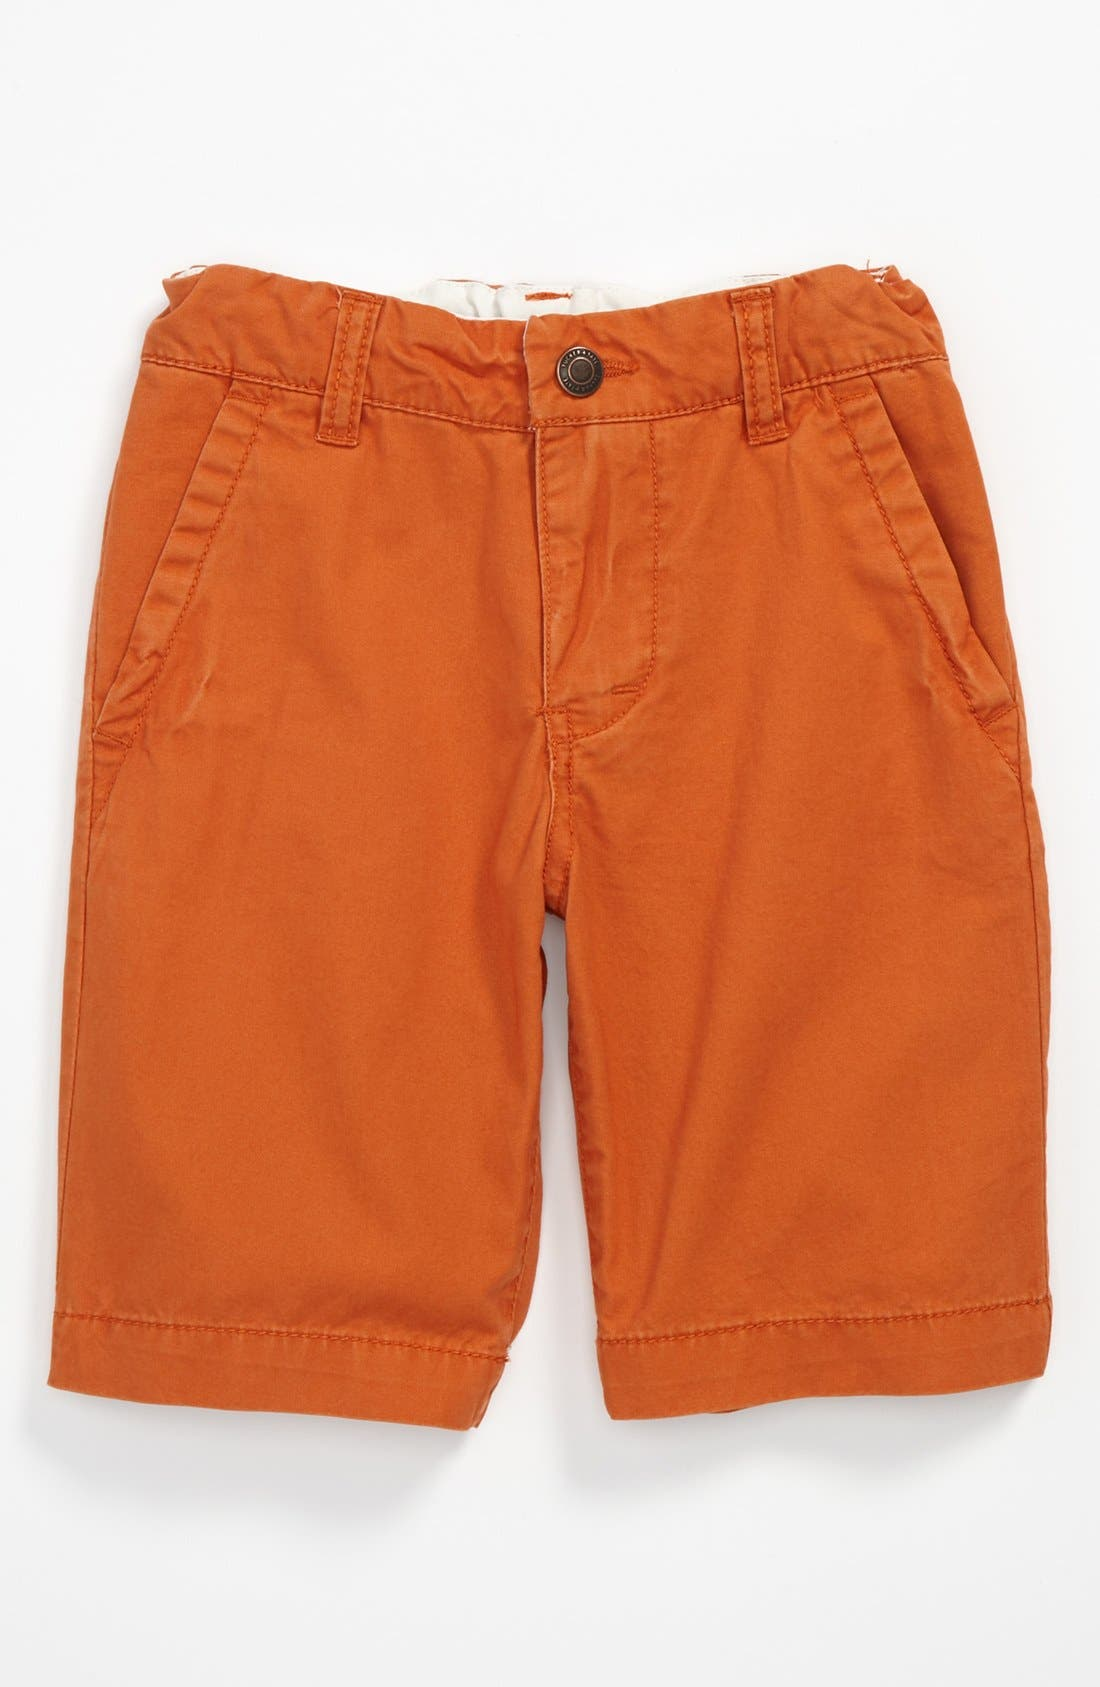 Alternate Image 1 Selected - Tucker + Tate 'Stunt' Chino Shorts (Toddler Boys)